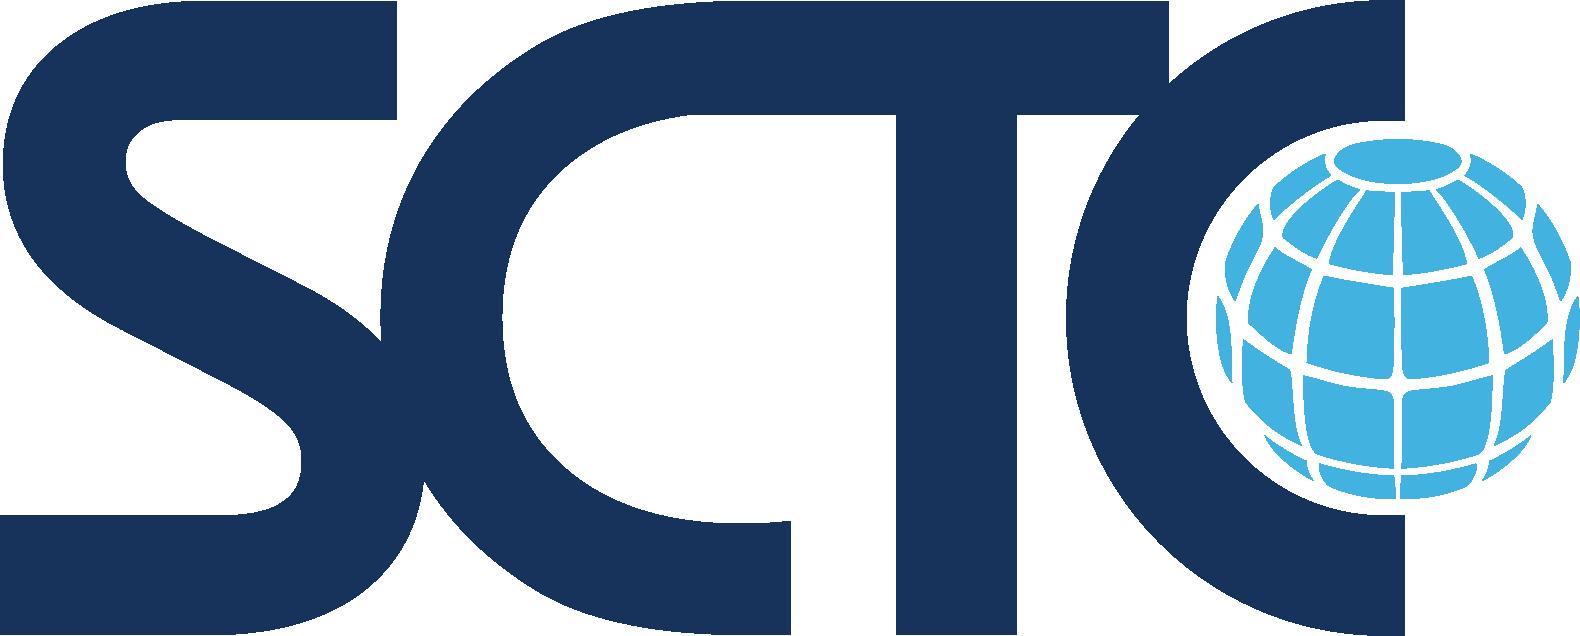 The SCTC logo